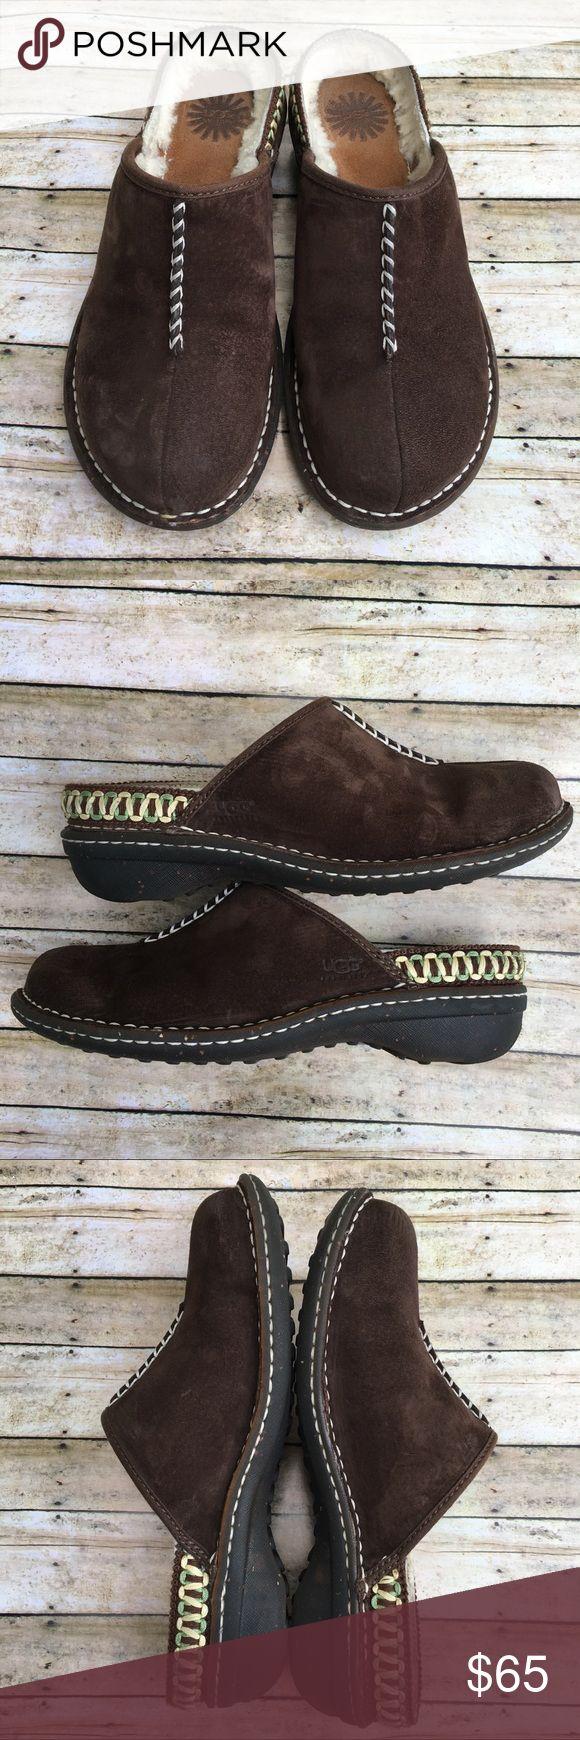 UGG 'Kohala' Mule Clog UGG 'Kohala' SZ 8 Brown Suede & Shearling Mule Clog. EUC. UGG Shoes Mules & Clogs